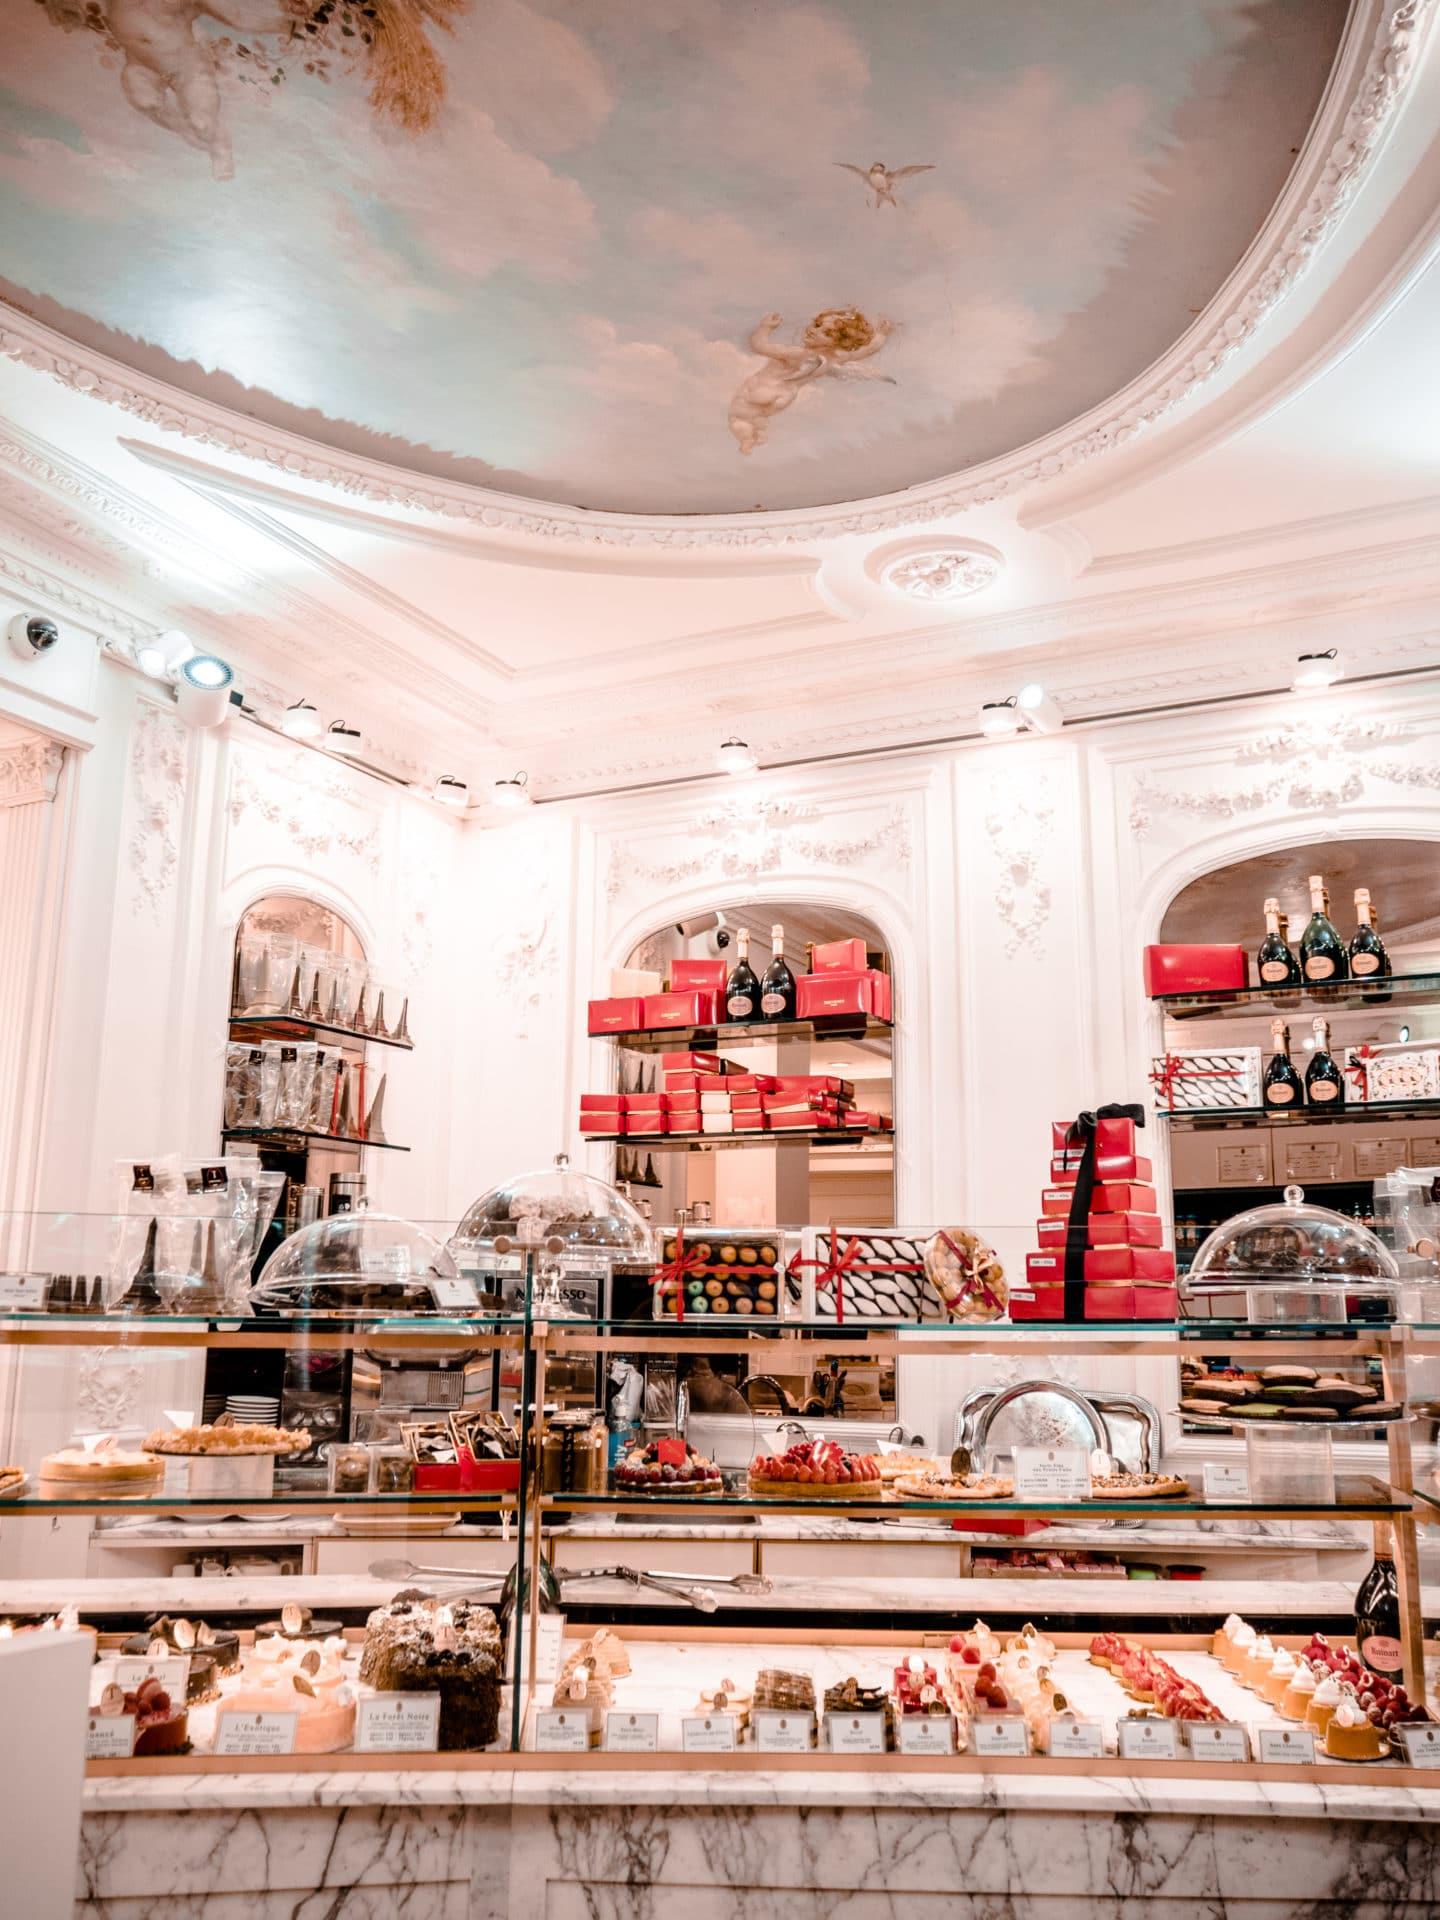 Thevenin Bäckerei & Konditorei Paris